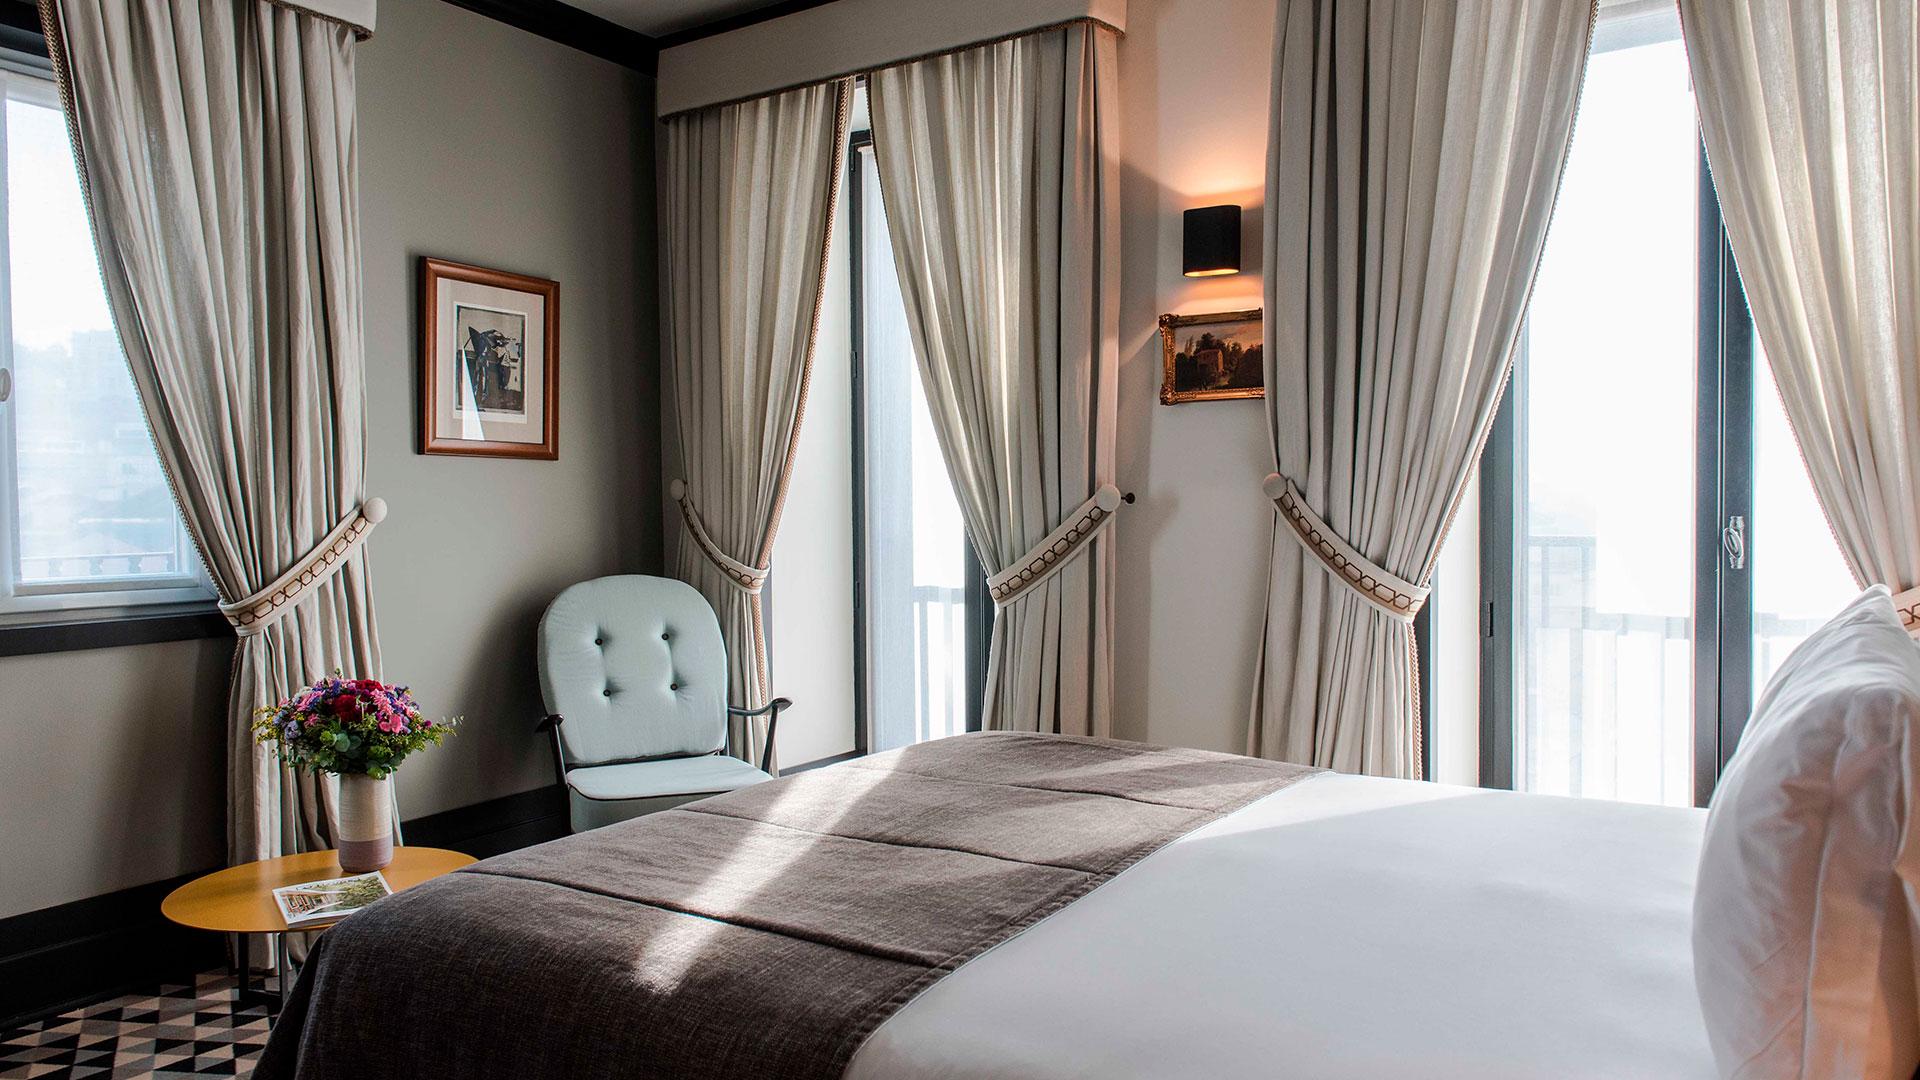 Imagen de hotel en Portugal